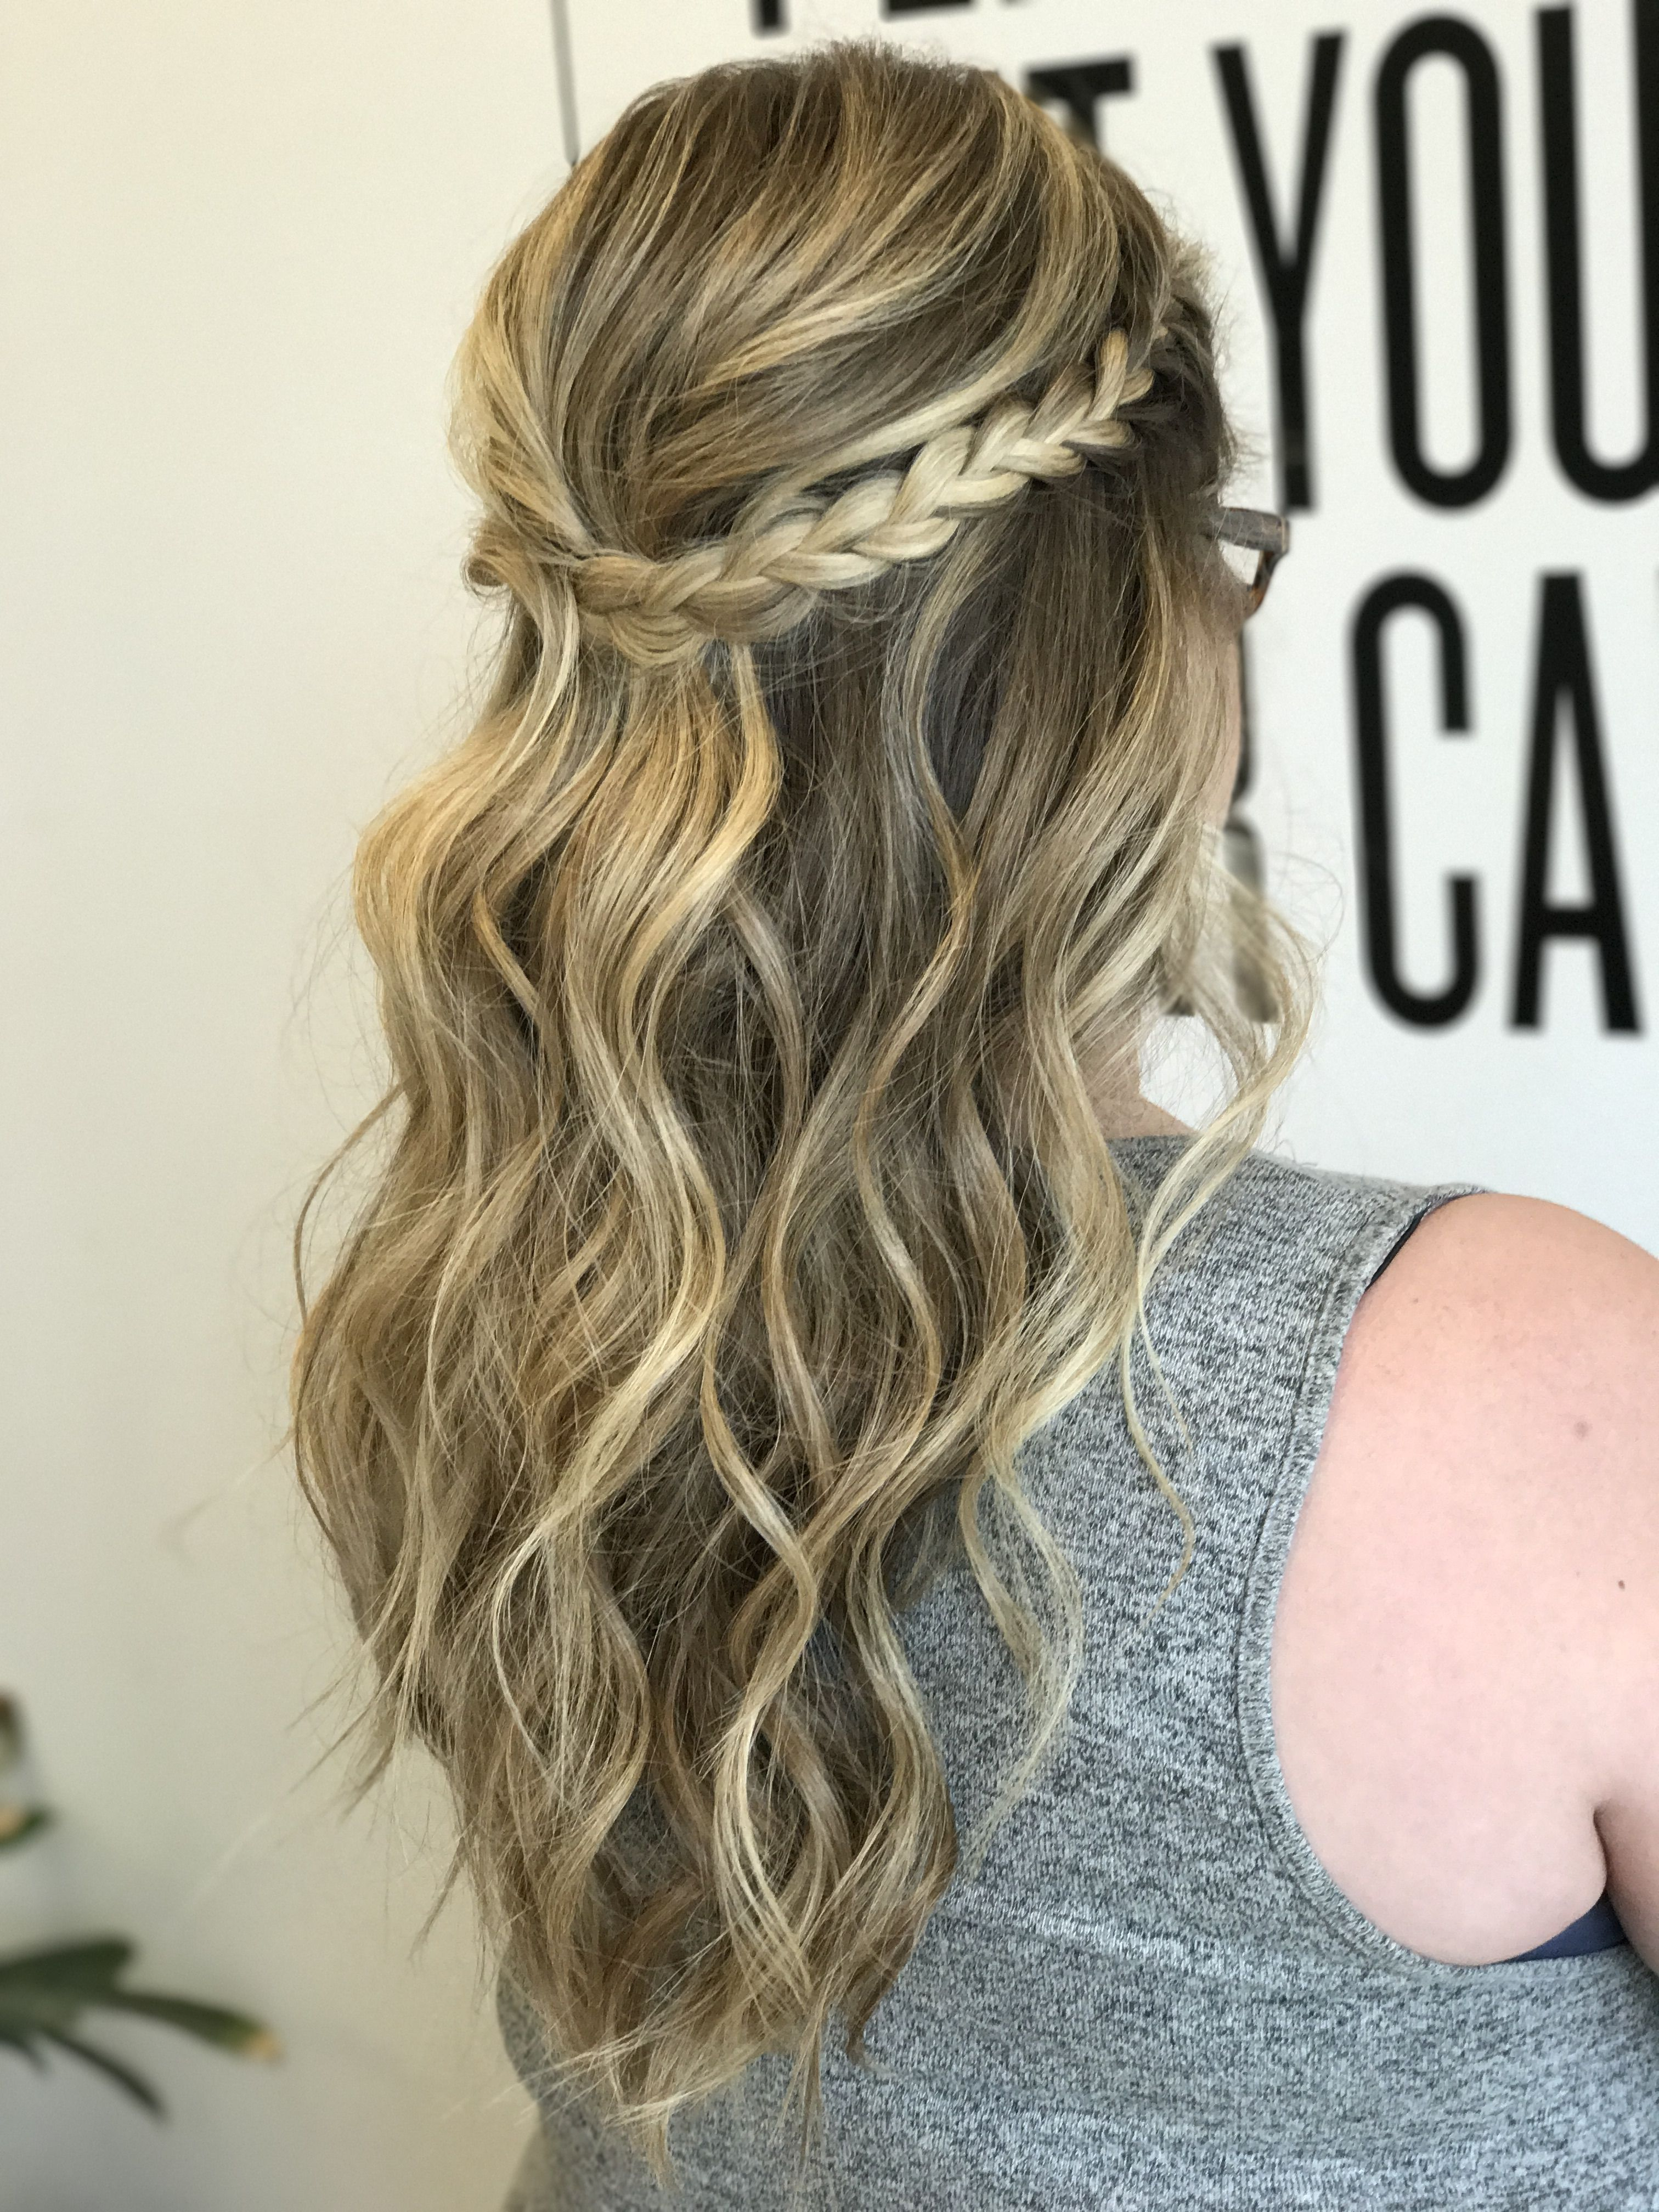 Half uphalf down Updo in Pinterest Wedding Hairstyles